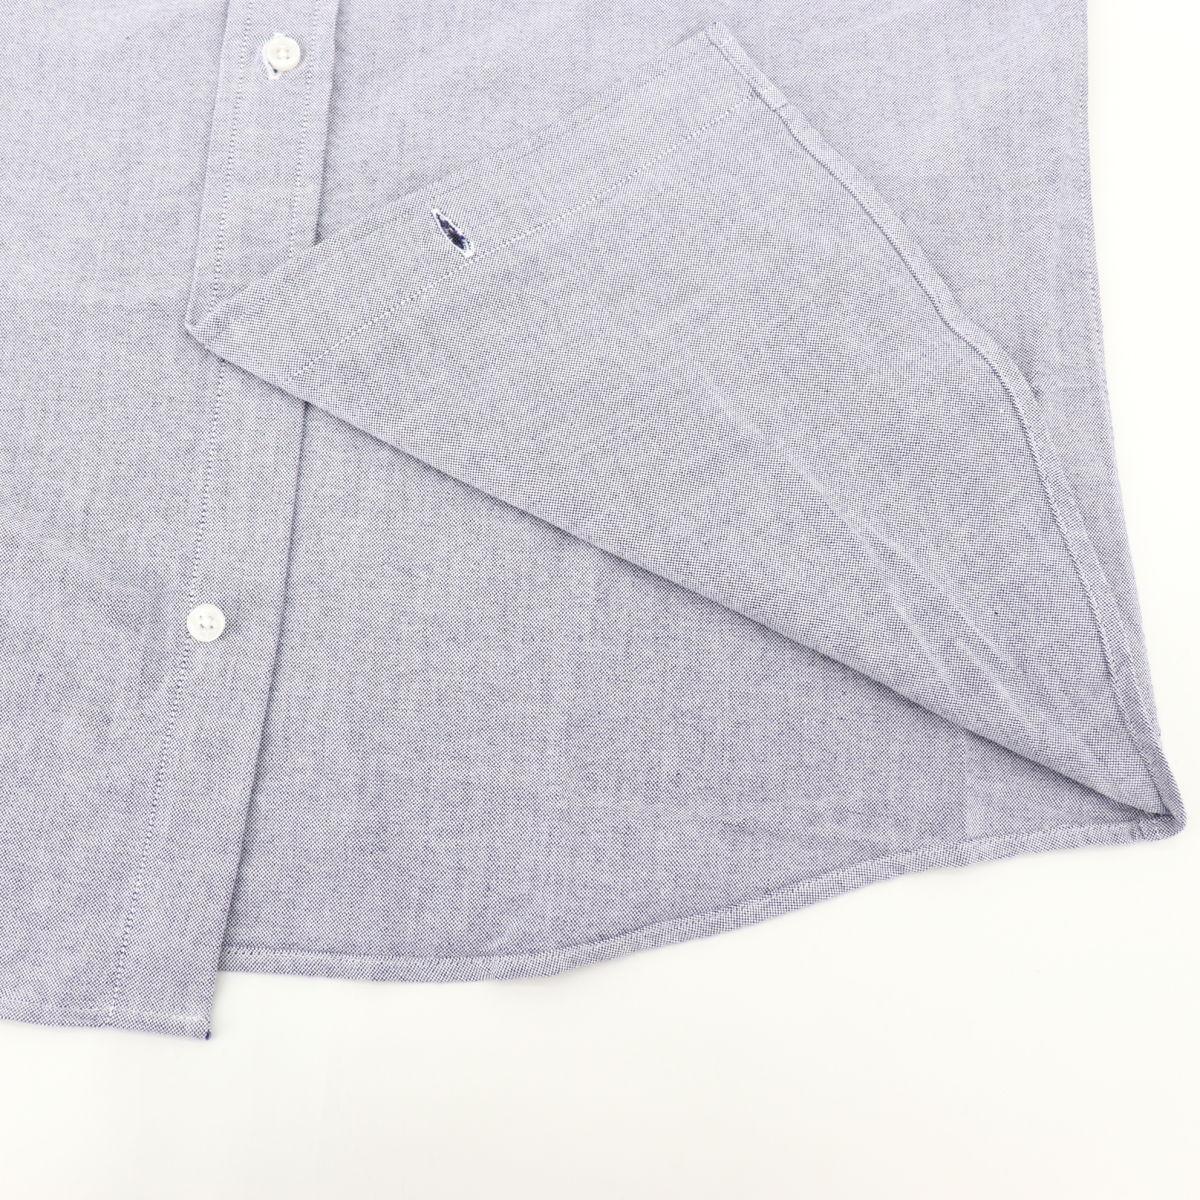 ★NEW!!定番 THE STANDARD SHIRT オックスフォード ボタンダウンシャツ 長袖(4colors)